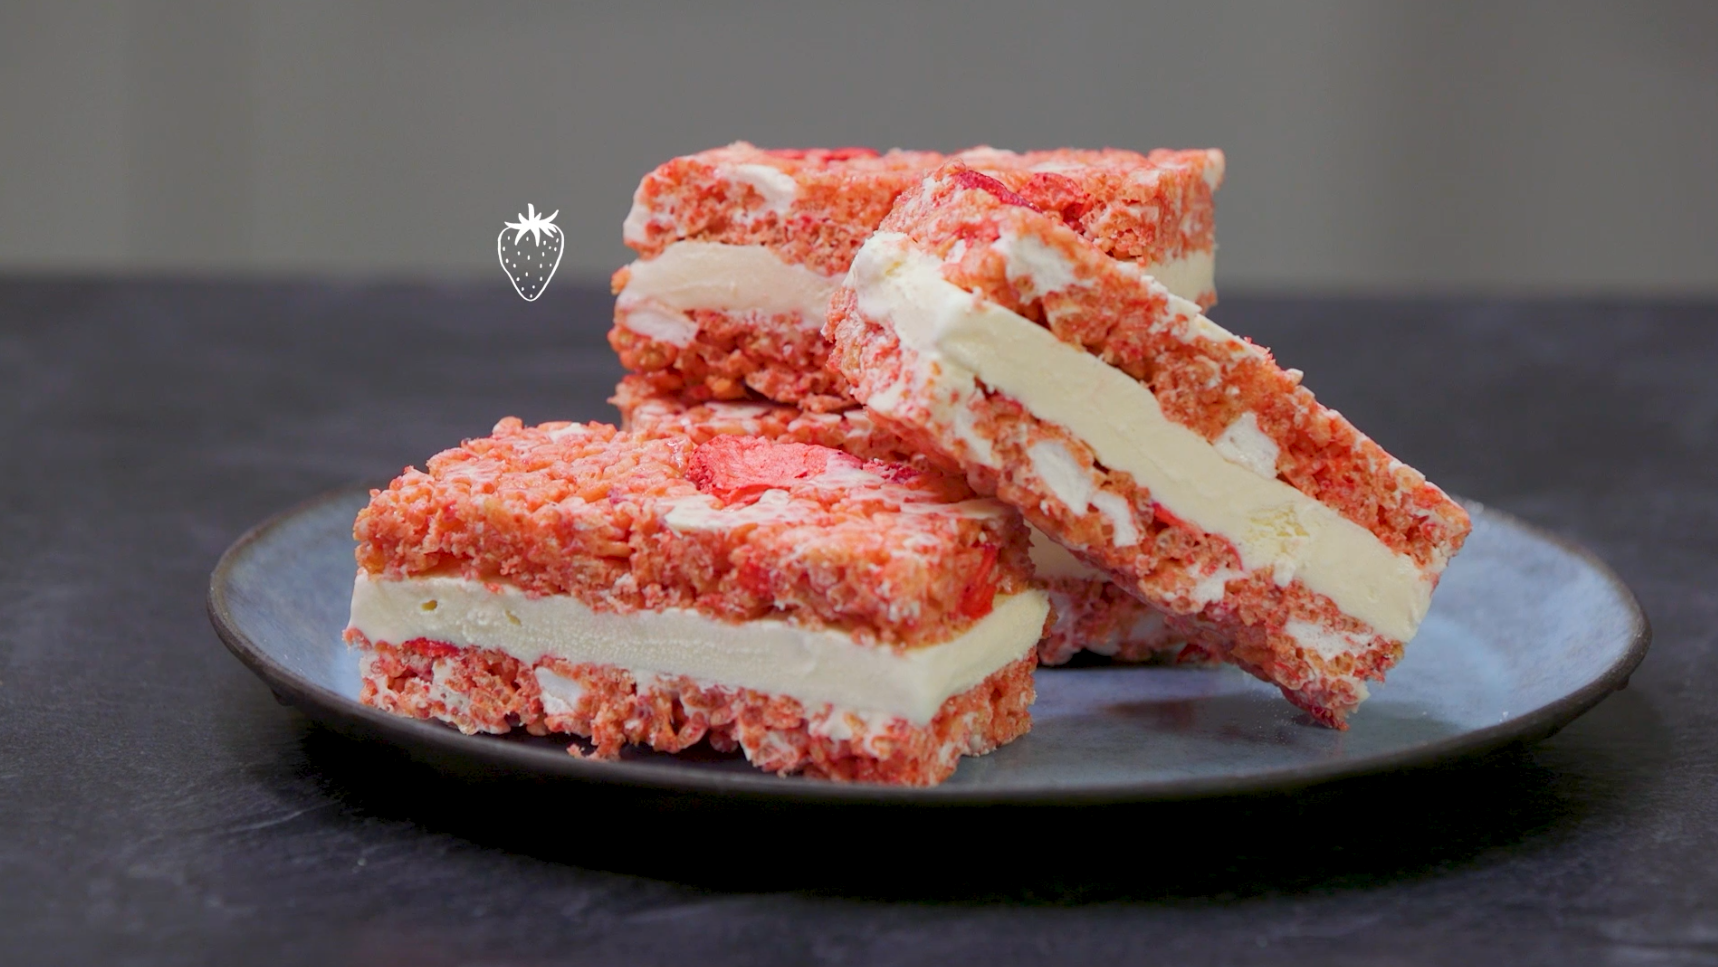 Grant Melton's Supercool Ice Cream Sandwiches